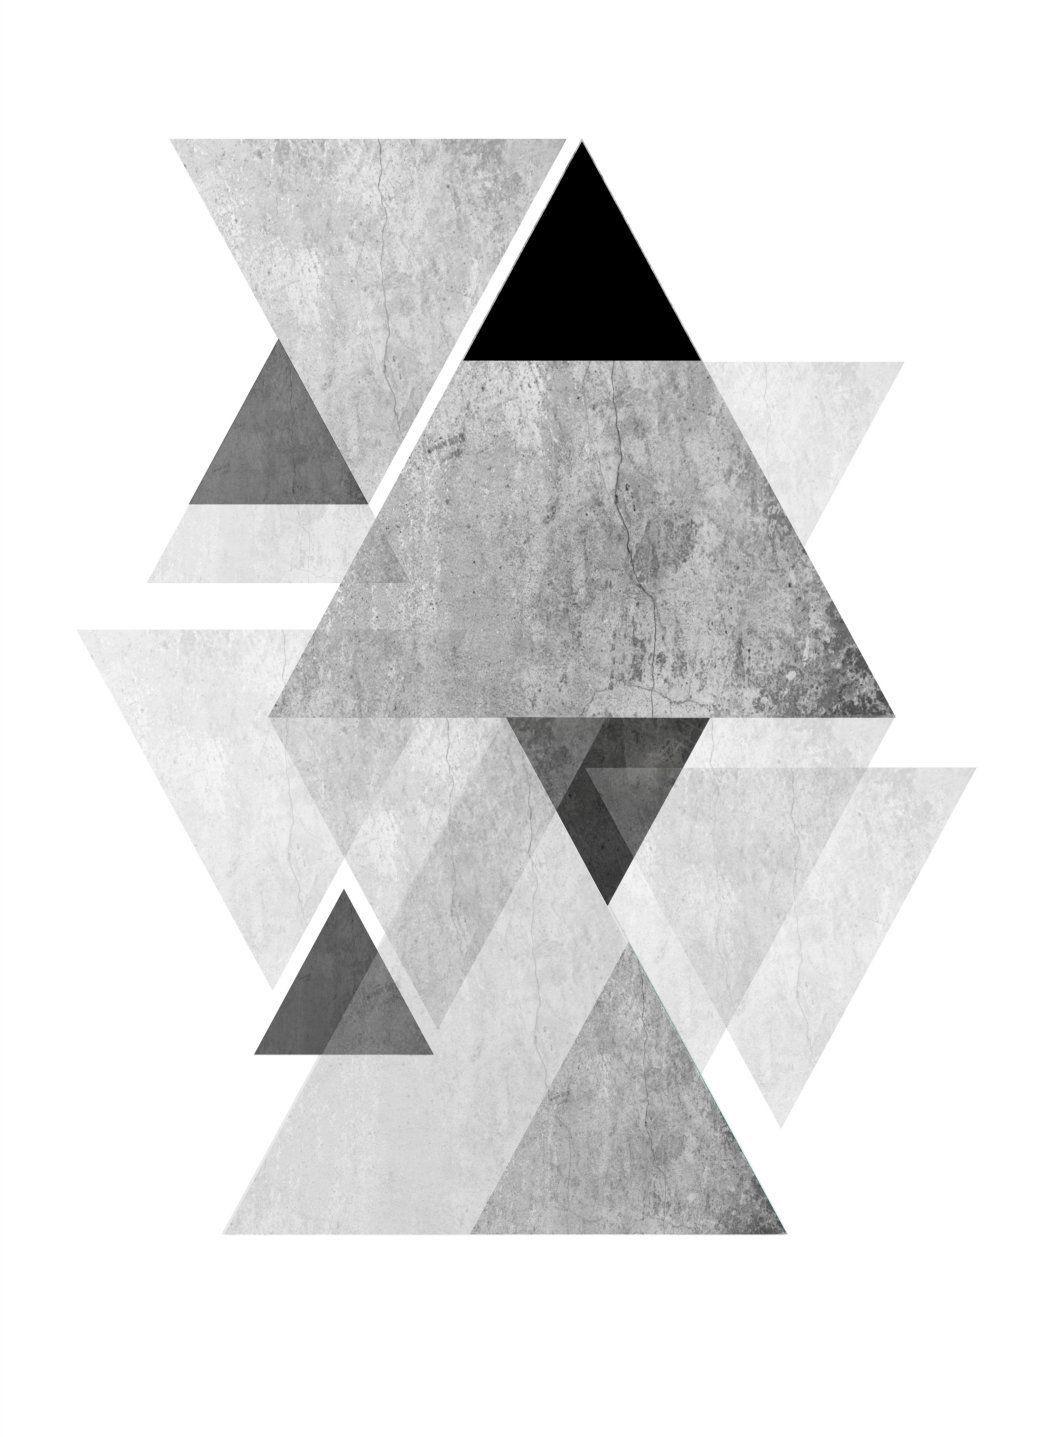 Downloadable Set Of 3 Scandinavian Geometric Tryptic Wall Art Prints Printable Wall Home Decor Trio Mountain Poster Navy Turquoise Teal Aqua Handmade Home Decor Home Decor Turquoise Room